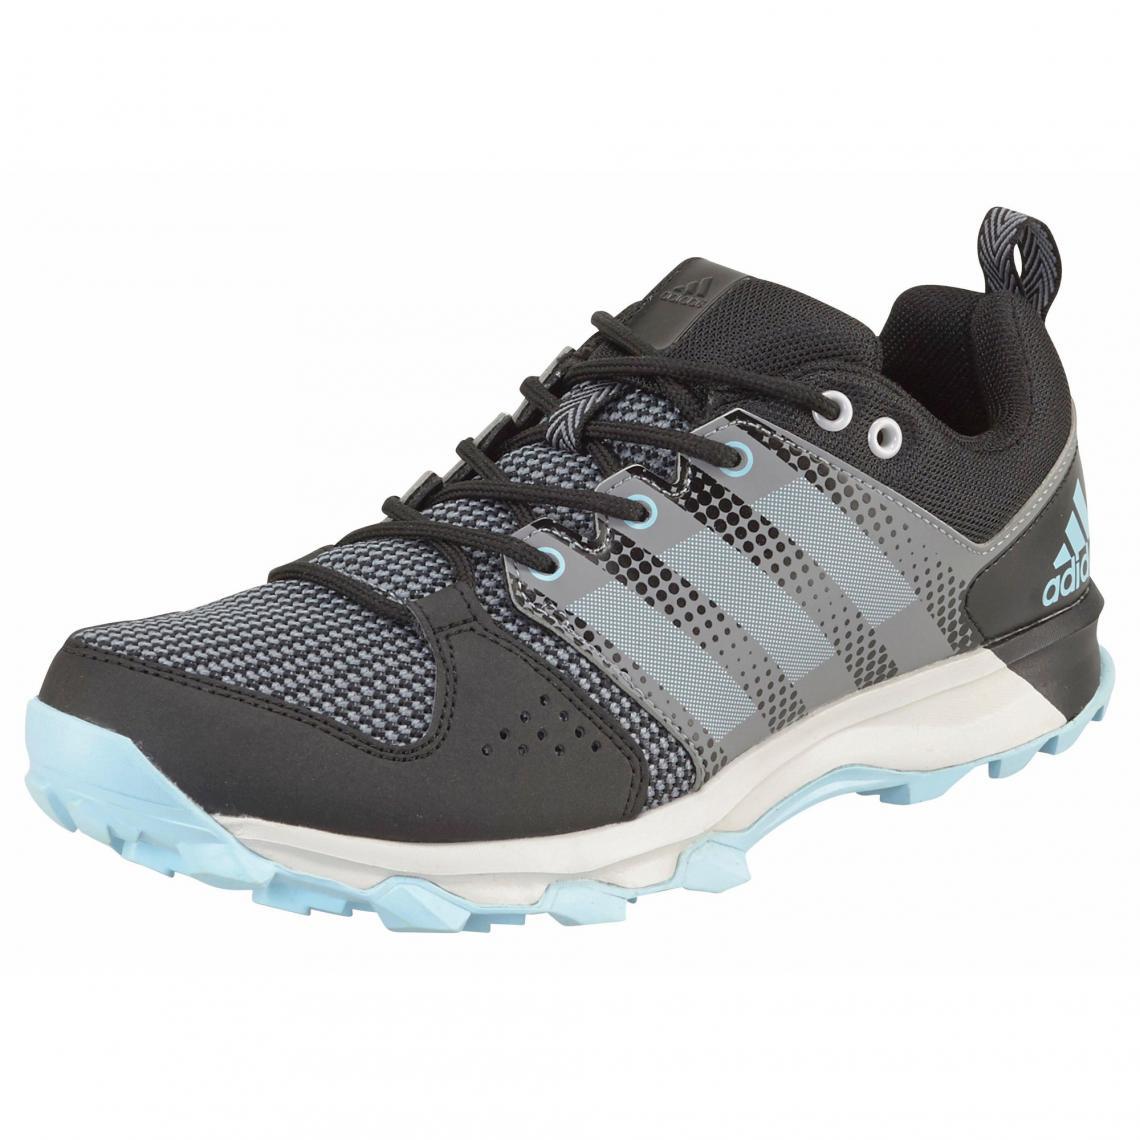 Chaussures Trail Adidas 1